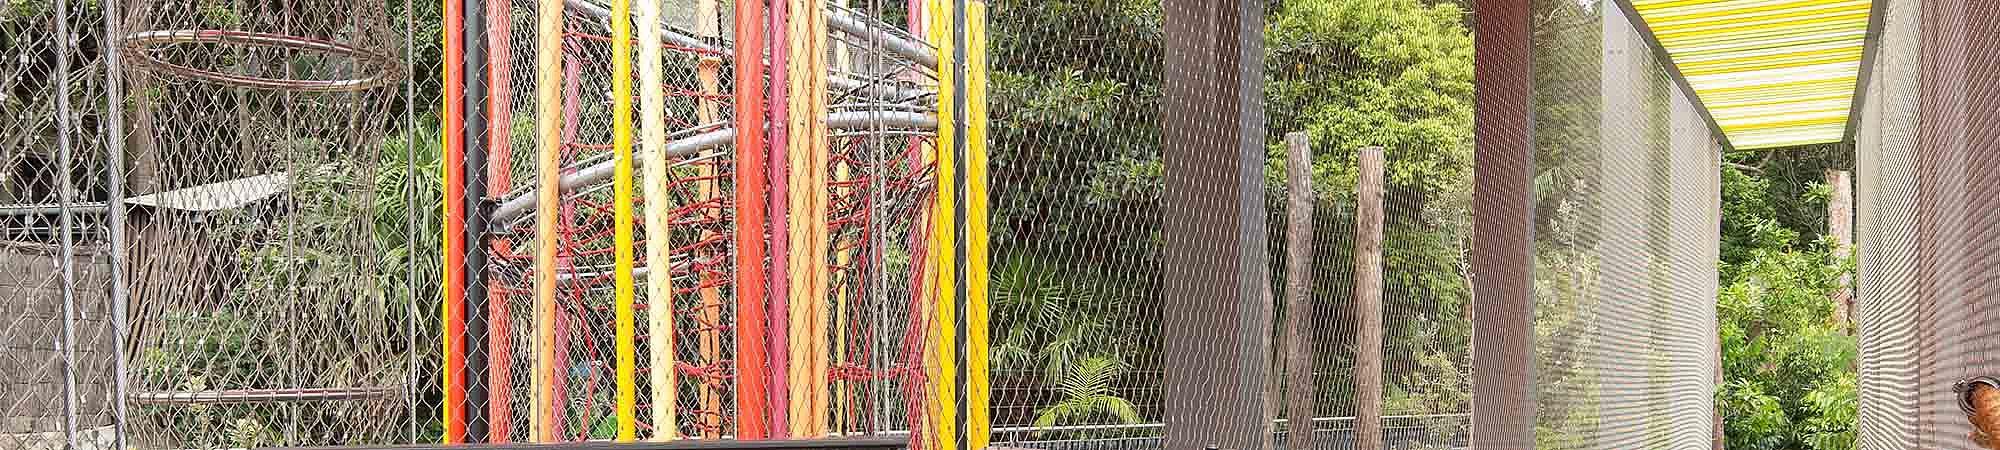 Lemuren Abenteuerspielplatz X-TEND Edelstahl-Seilnetz